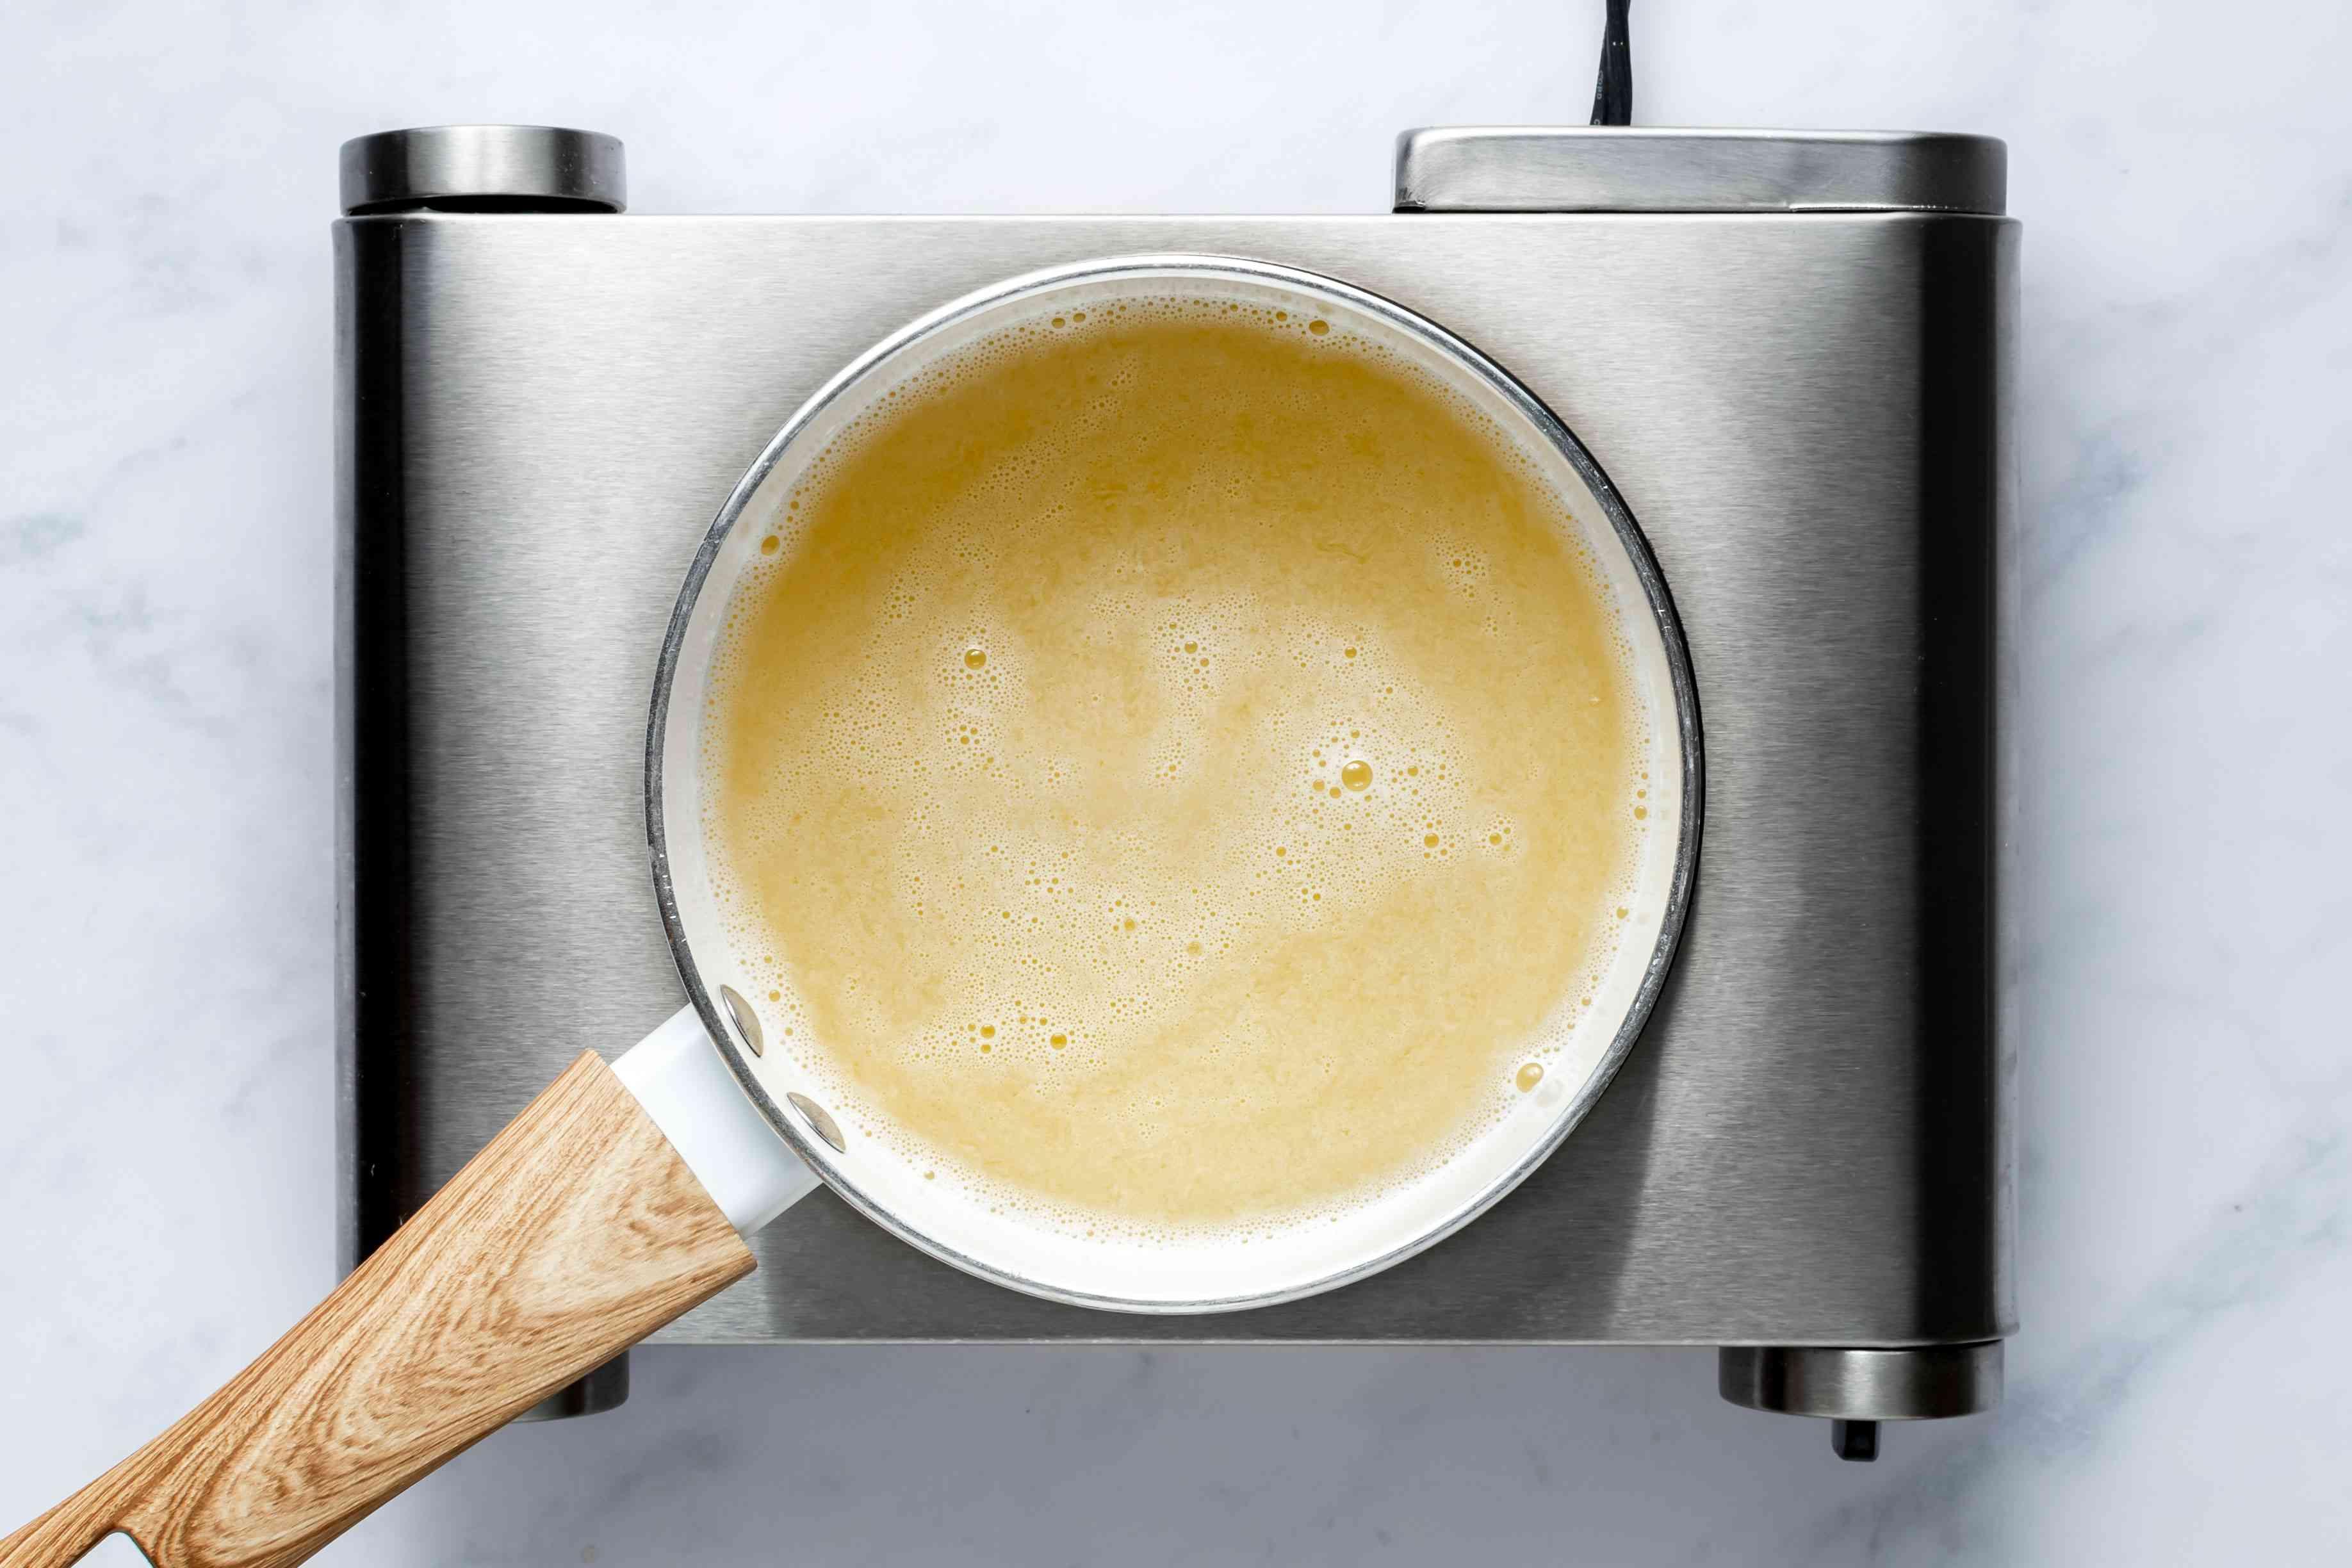 lemonade-gelatin mixture in a pan